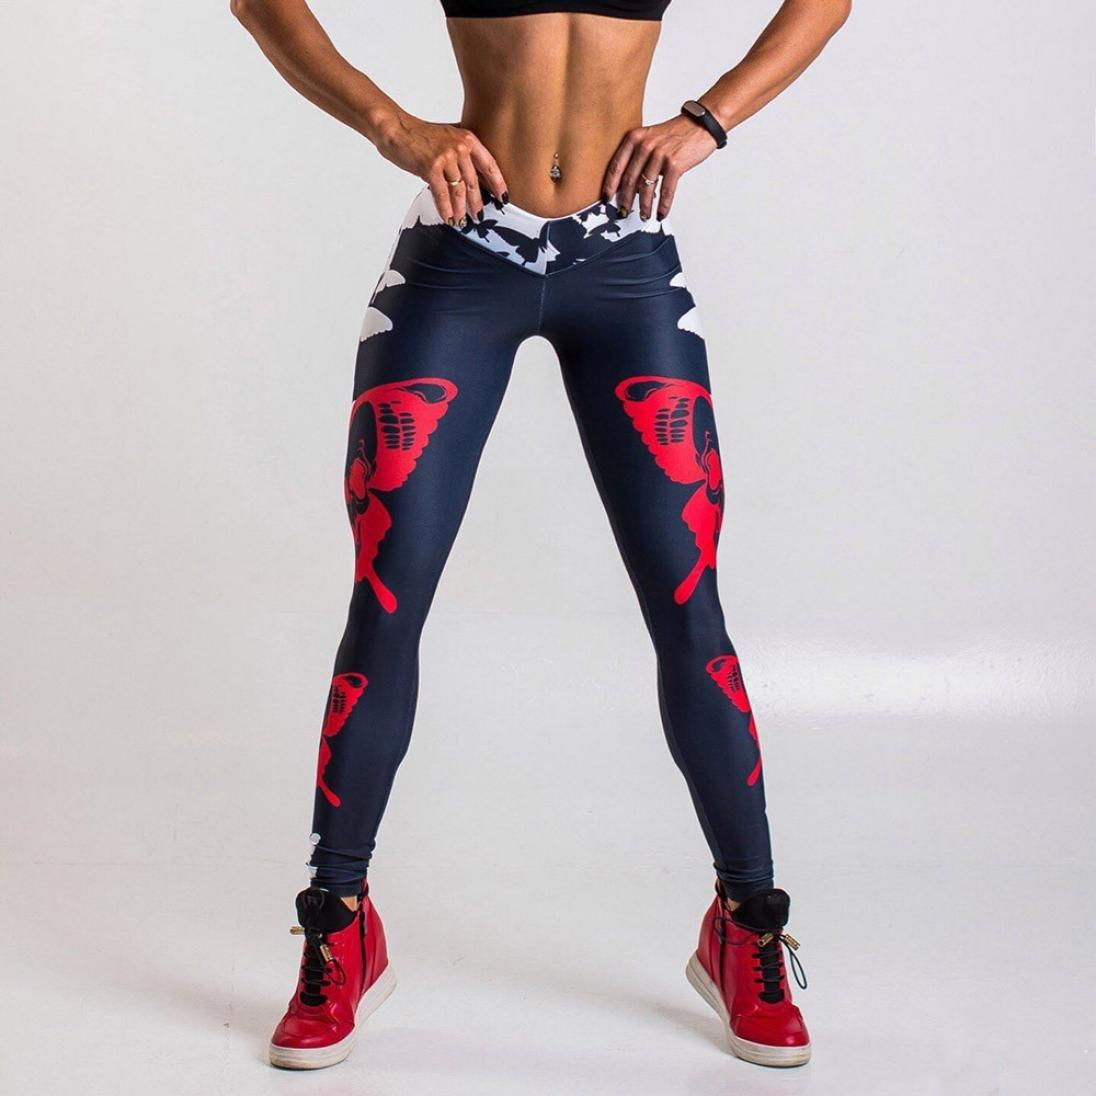 03d844b638f89 Amazon.com: Gillberry Women Sports Gym Yoga Workout Mid Waist Running Pants  Fitness Elastic Leggings: Clothing